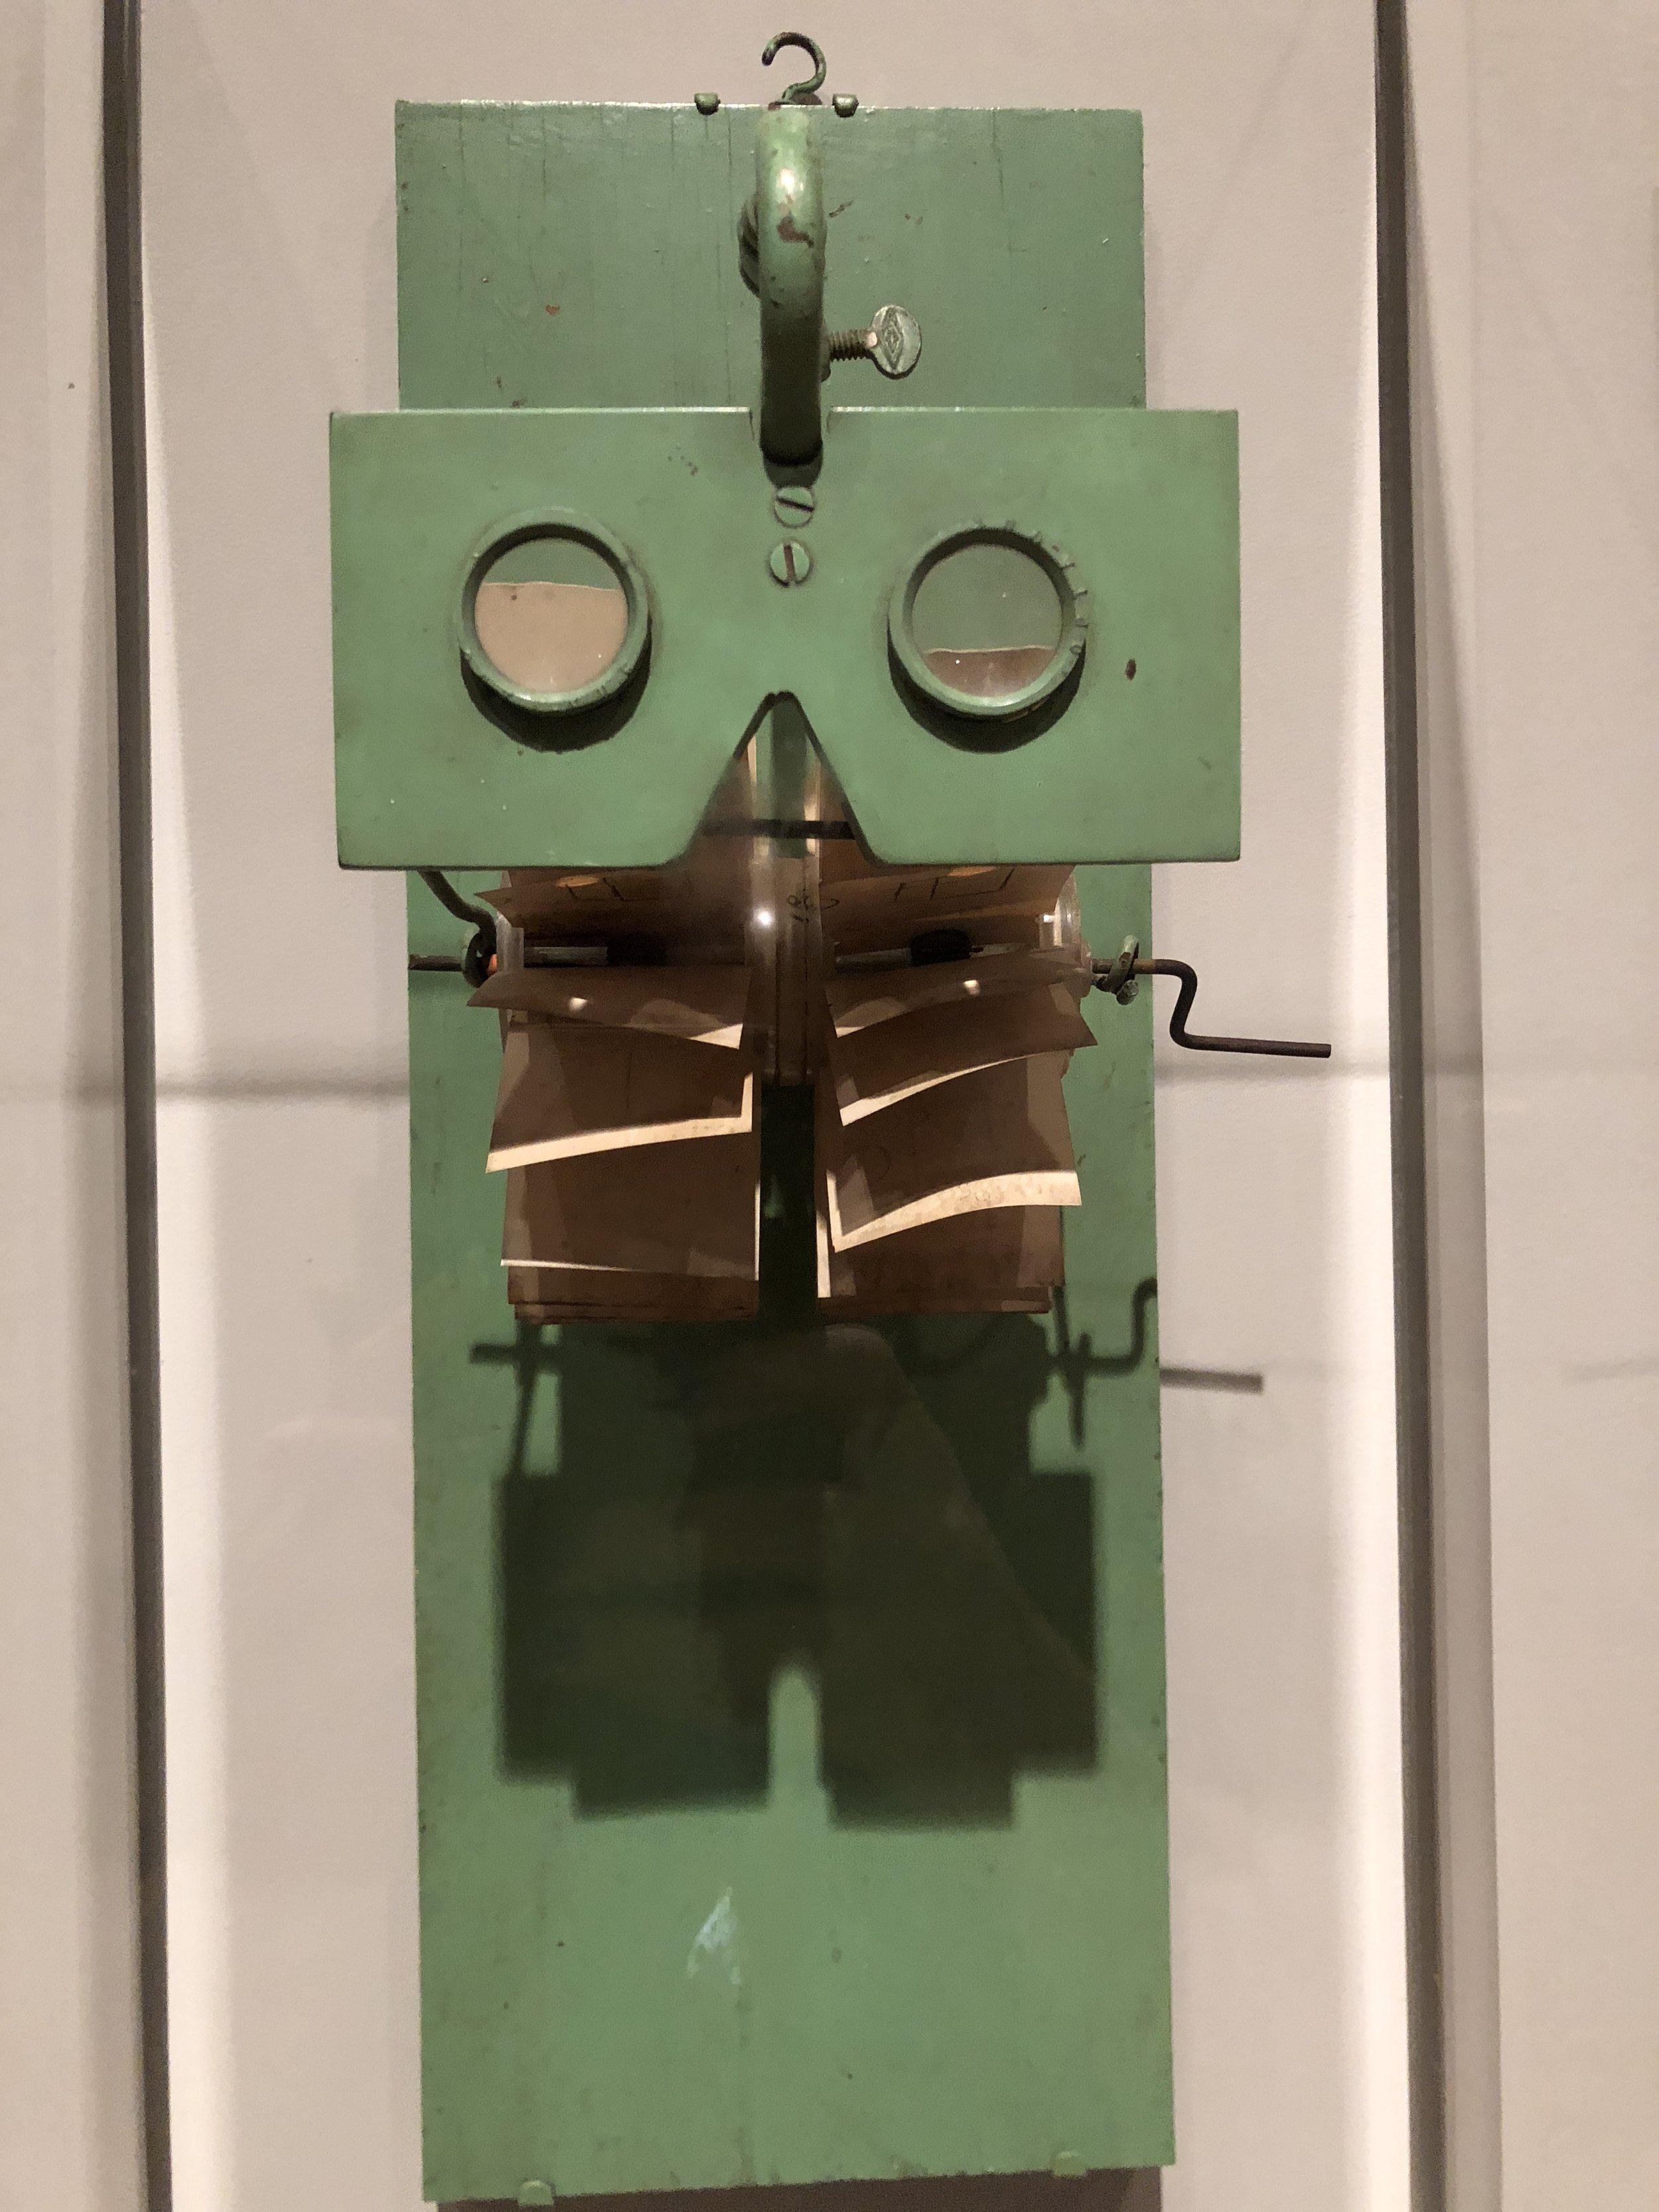 Robert Breer,  3D Mutoscope  1978